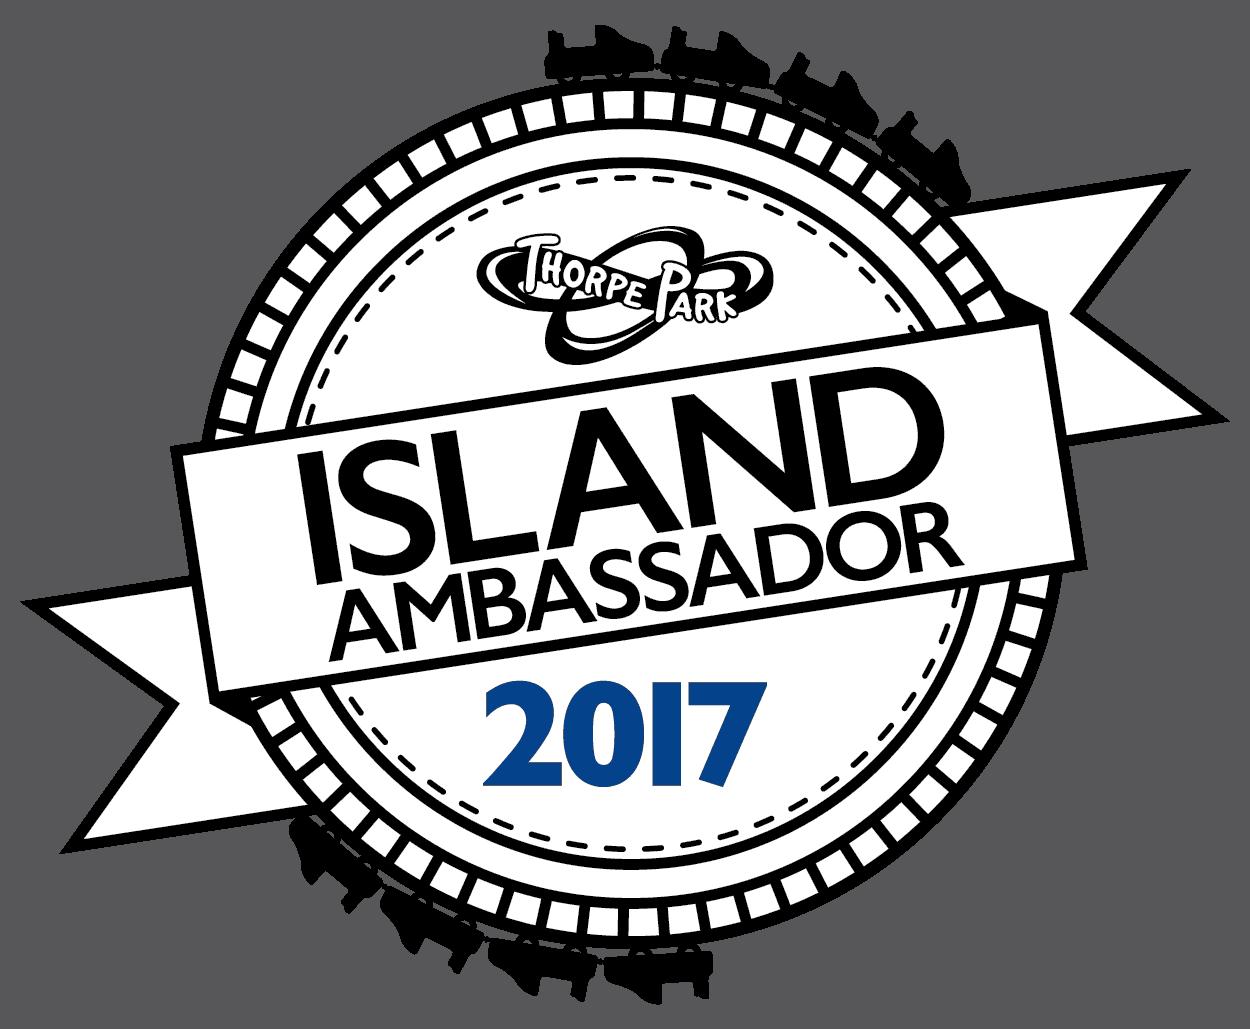 TP16-573 – ISLAND AMBASSADOR BADGE-01